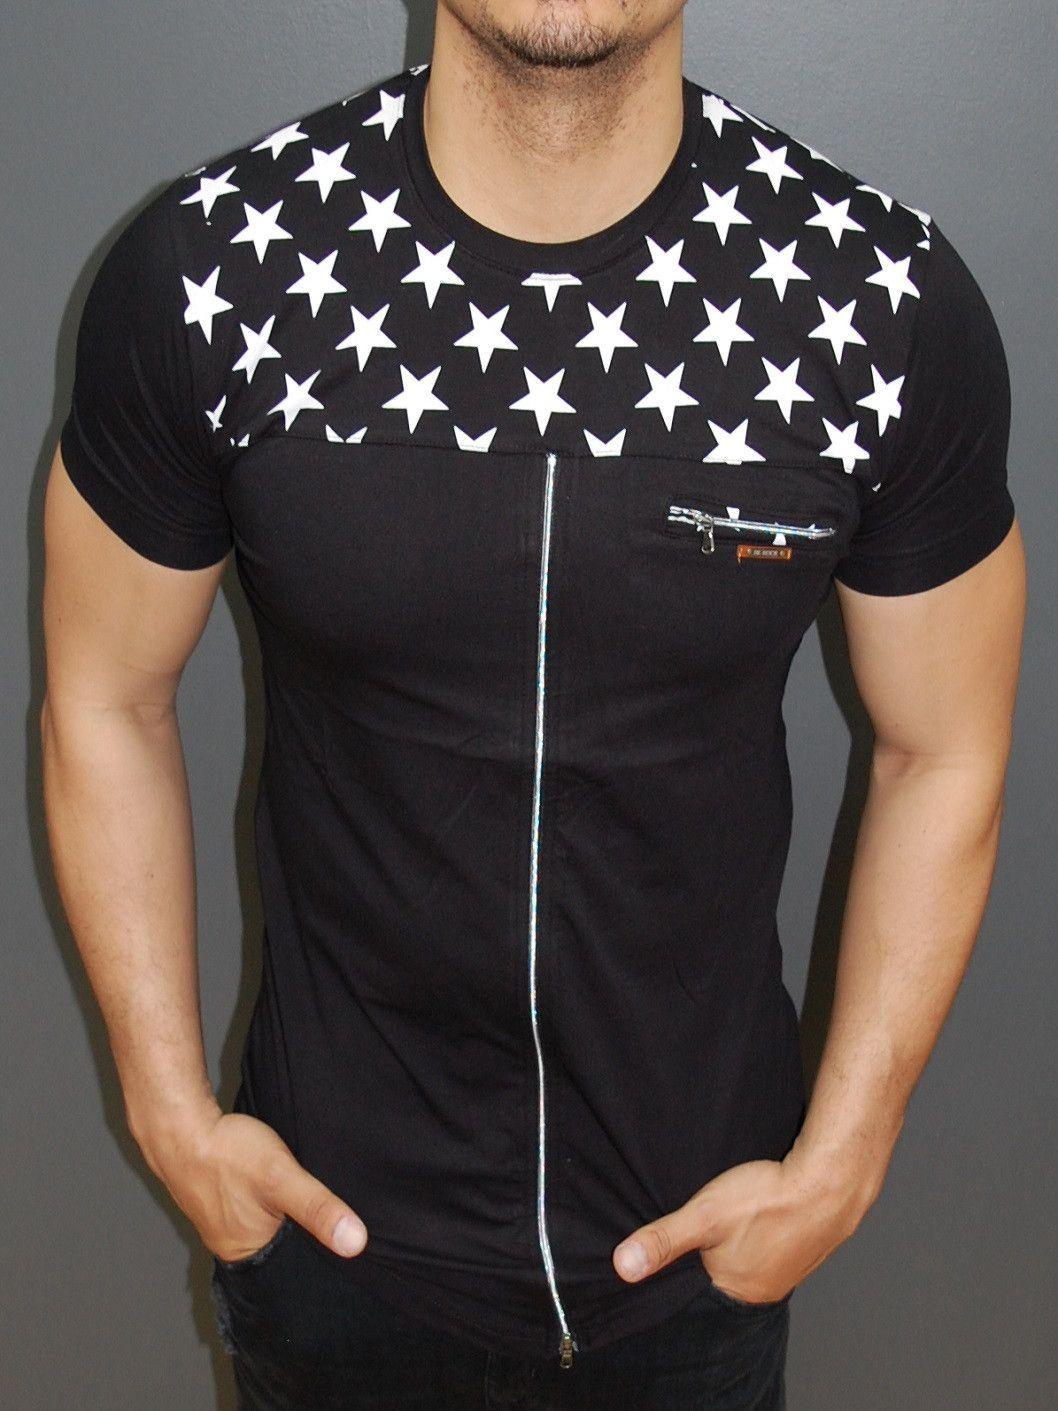 Black t shirt with zipper - R R Men Stars Top Front Back Zipper T Shirt Black